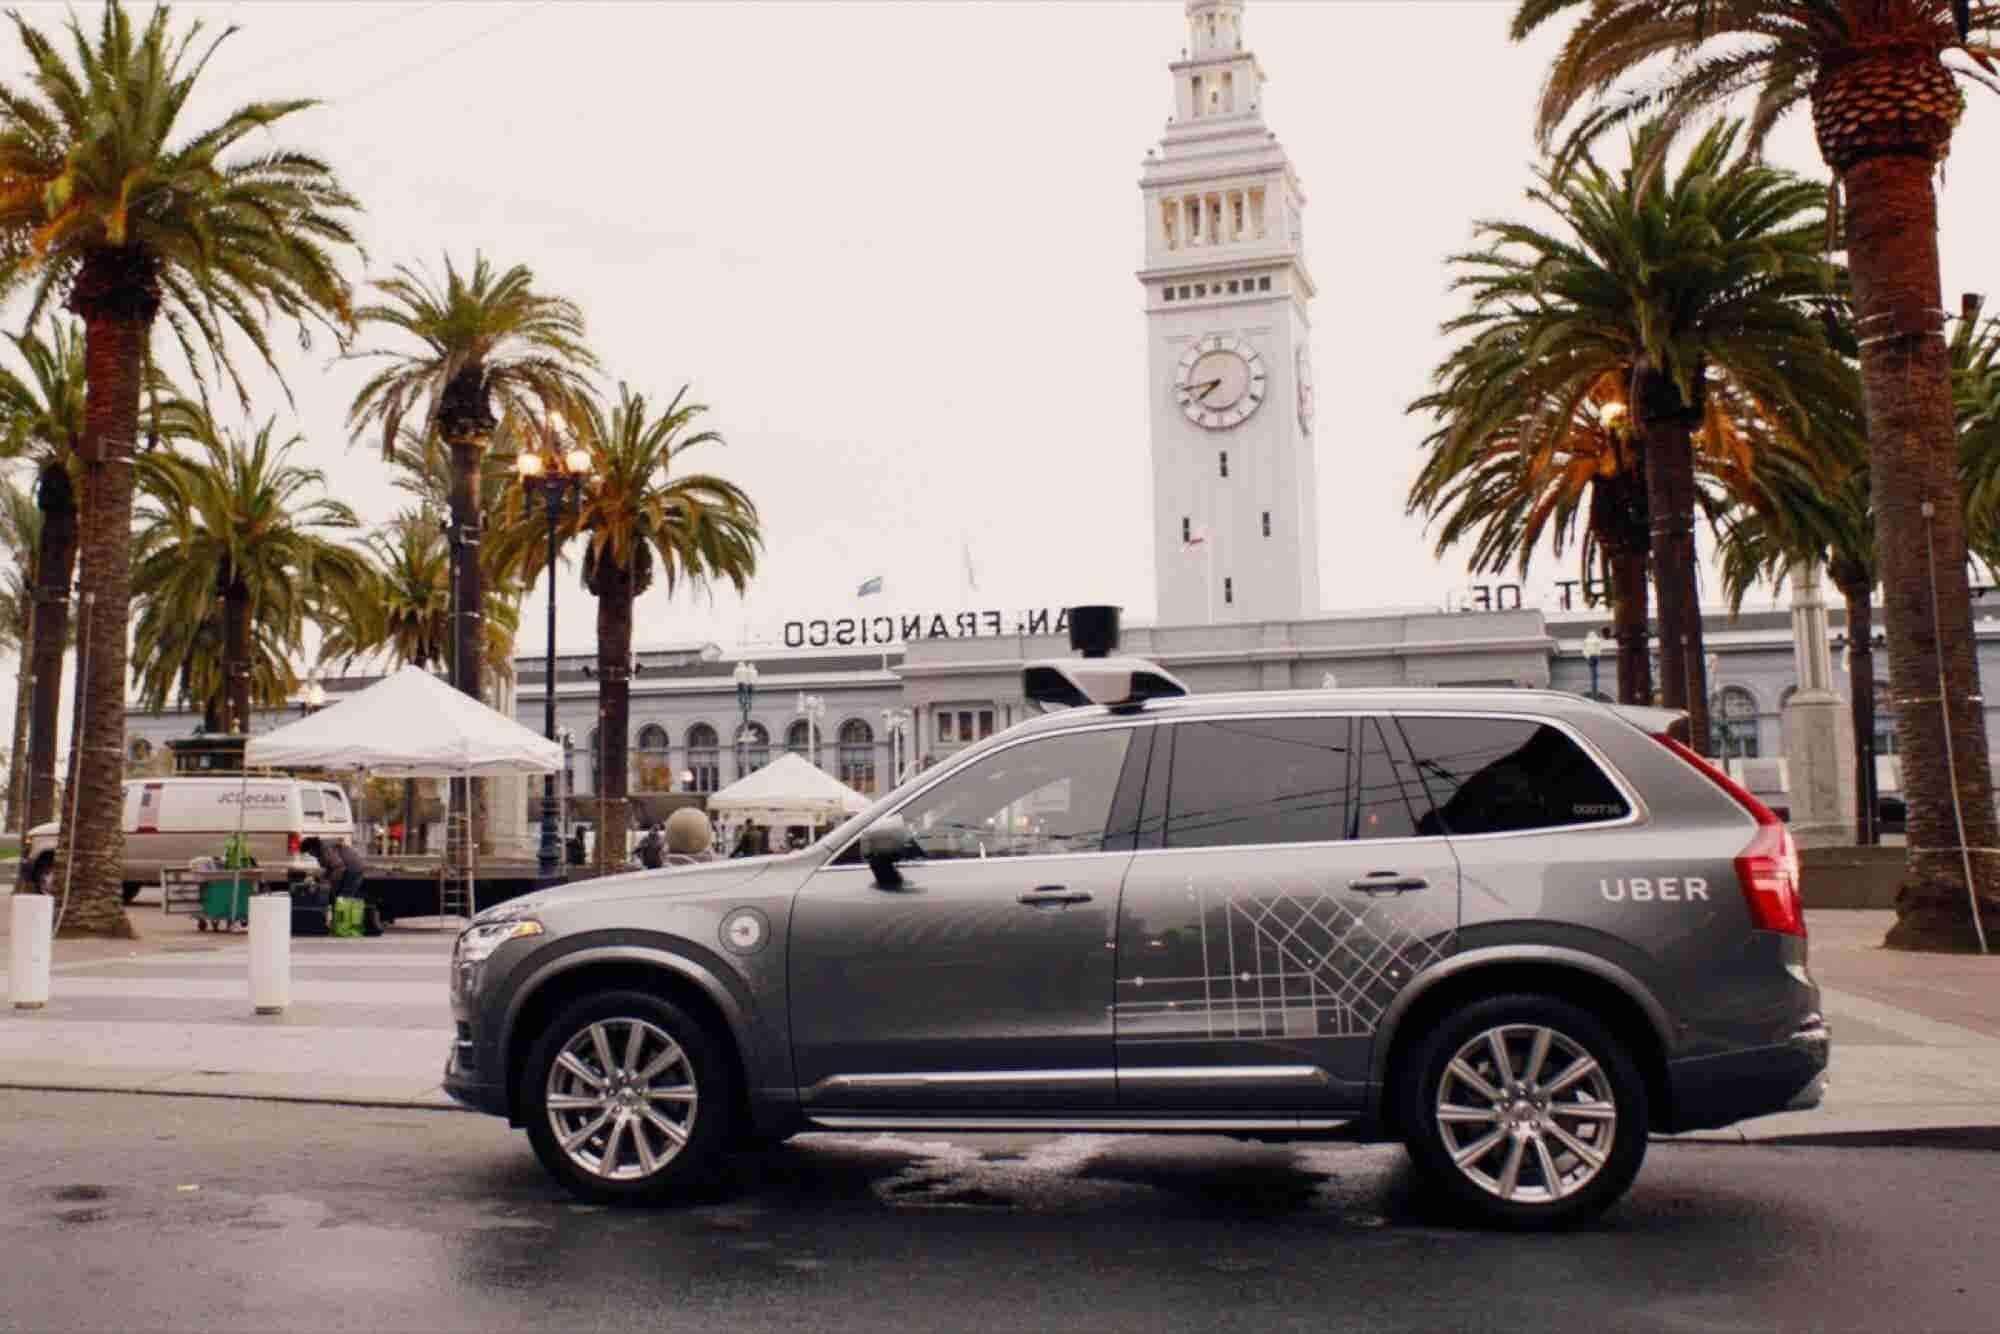 Human Driving Autonomous Uber Car Caught Running Red Light